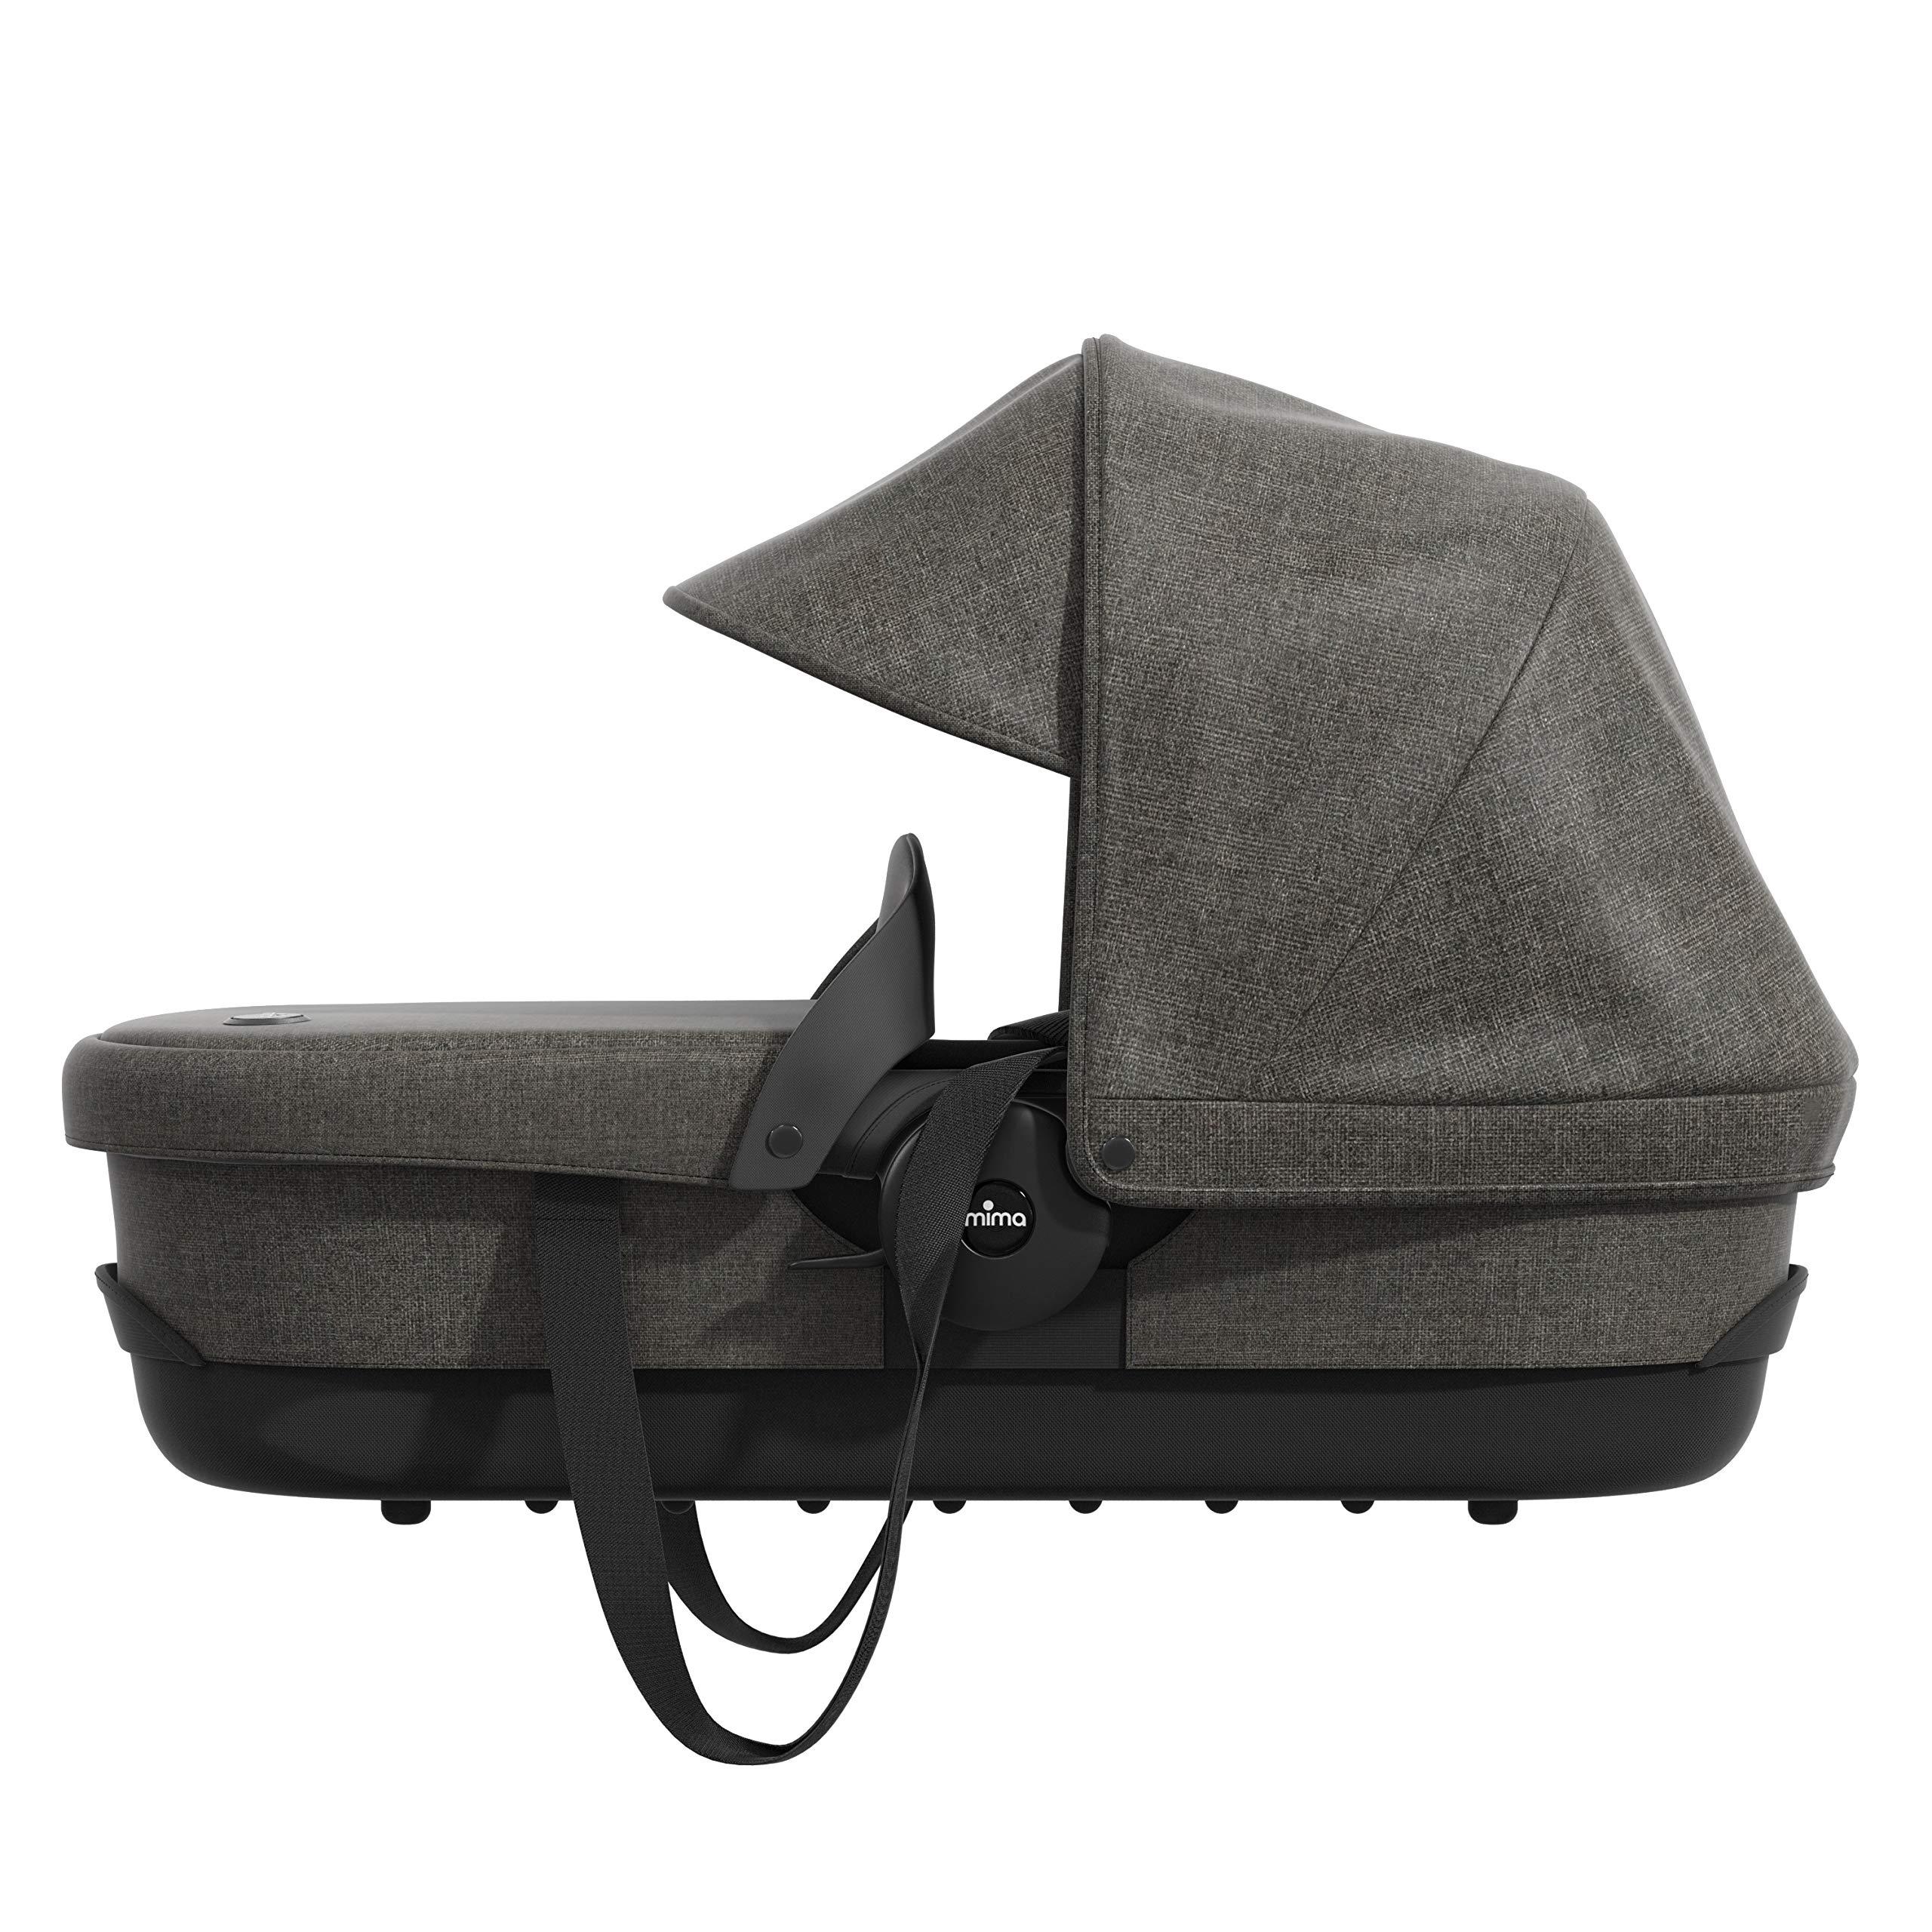 Mima Zigi Travel Carry Cot Charcoal